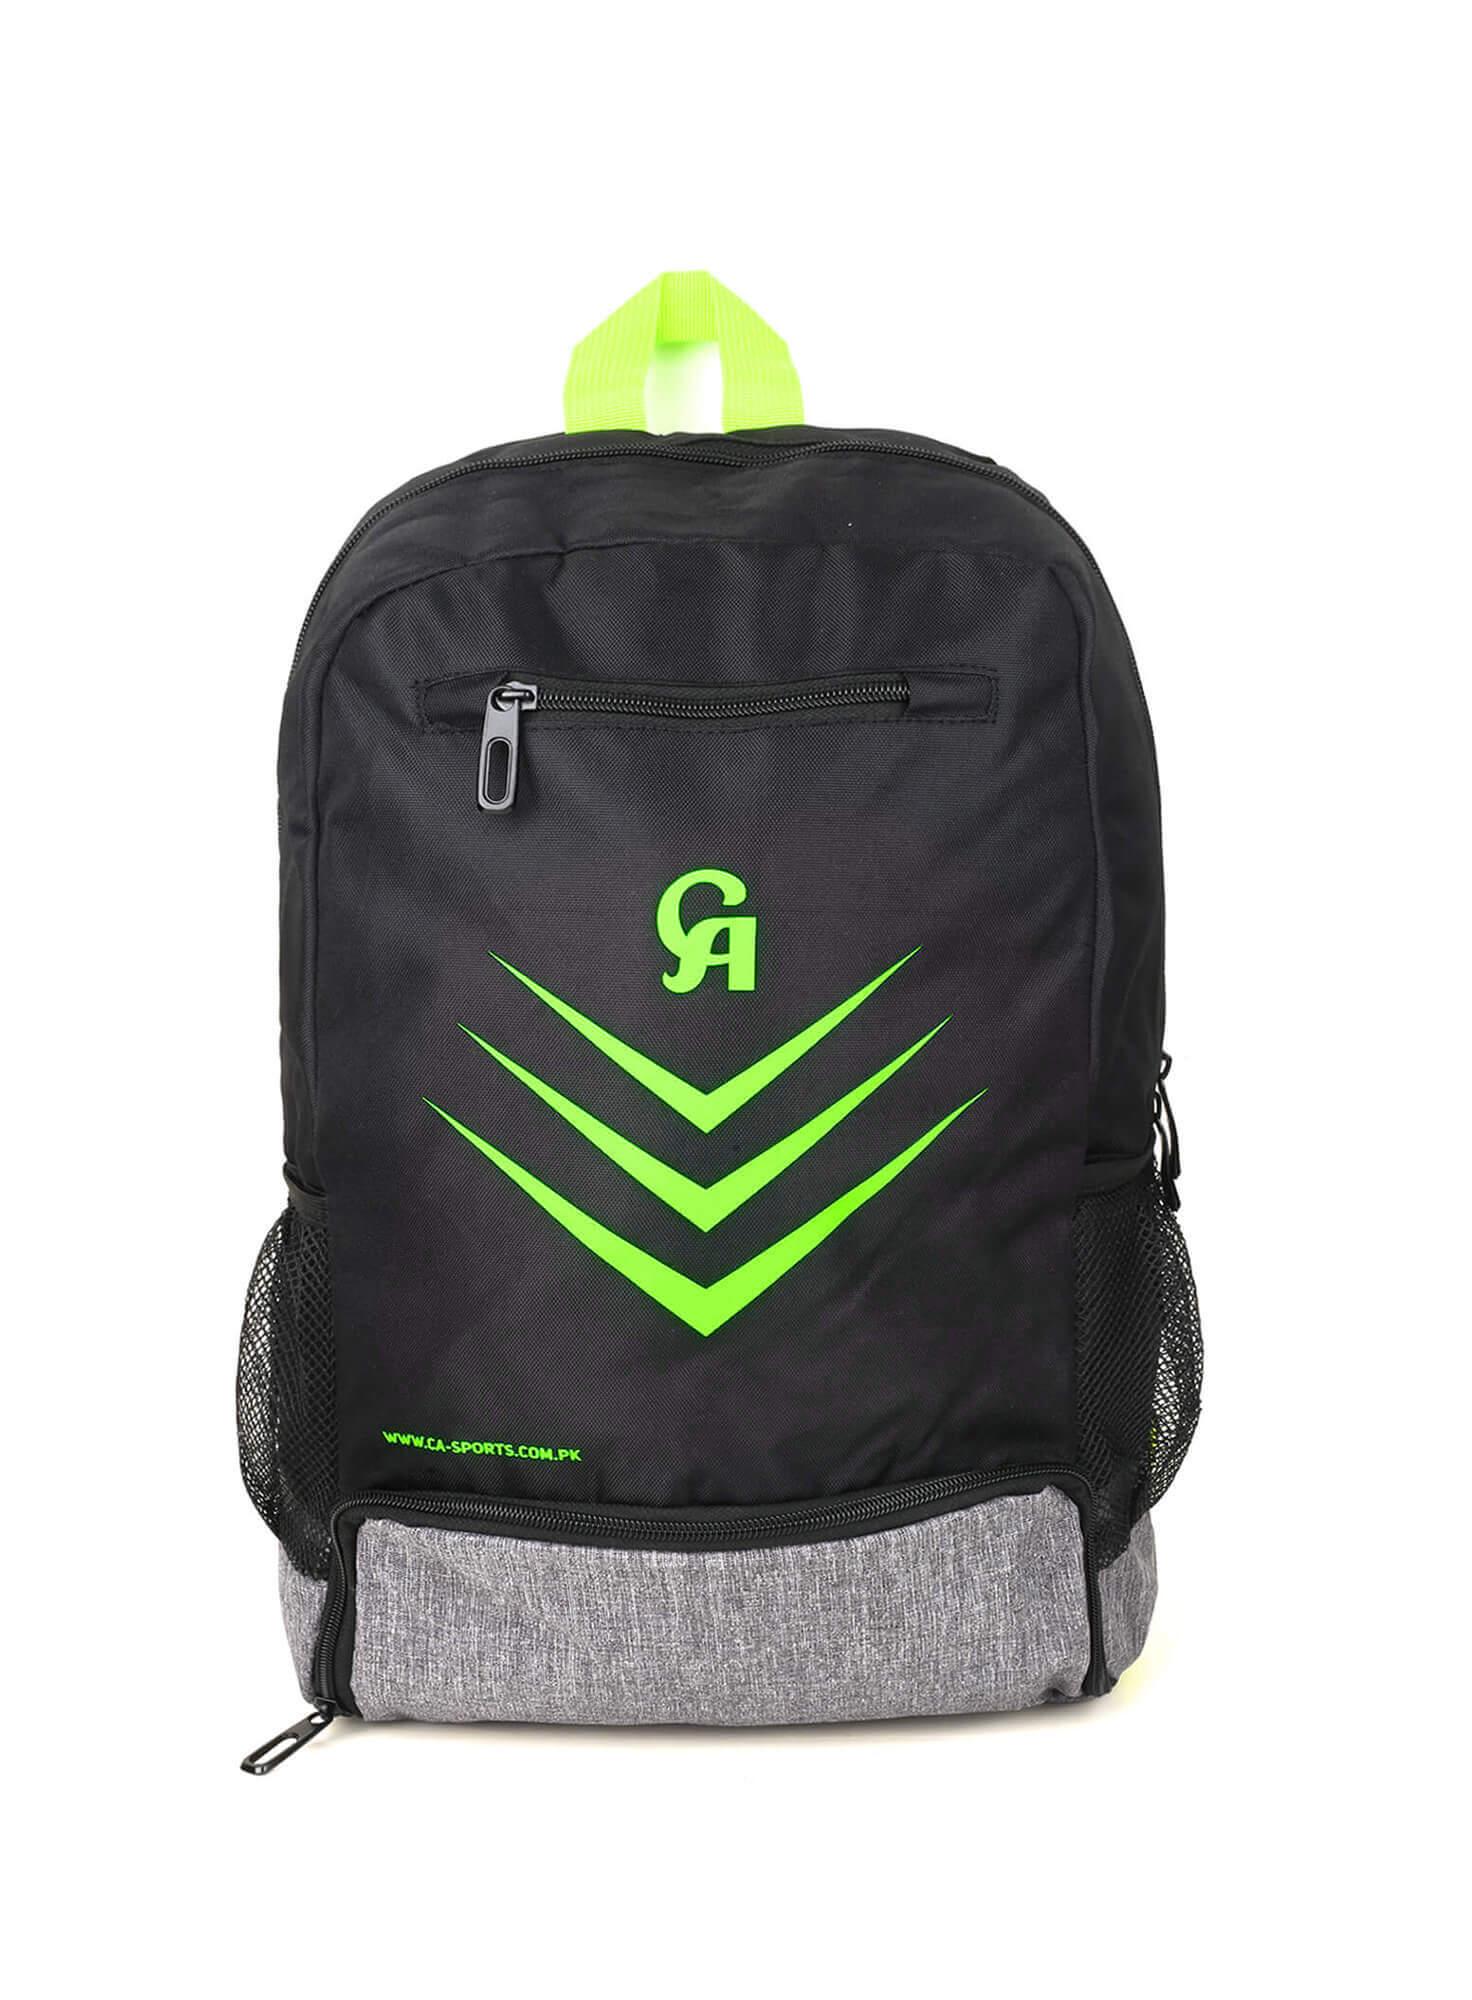 backpack, bag